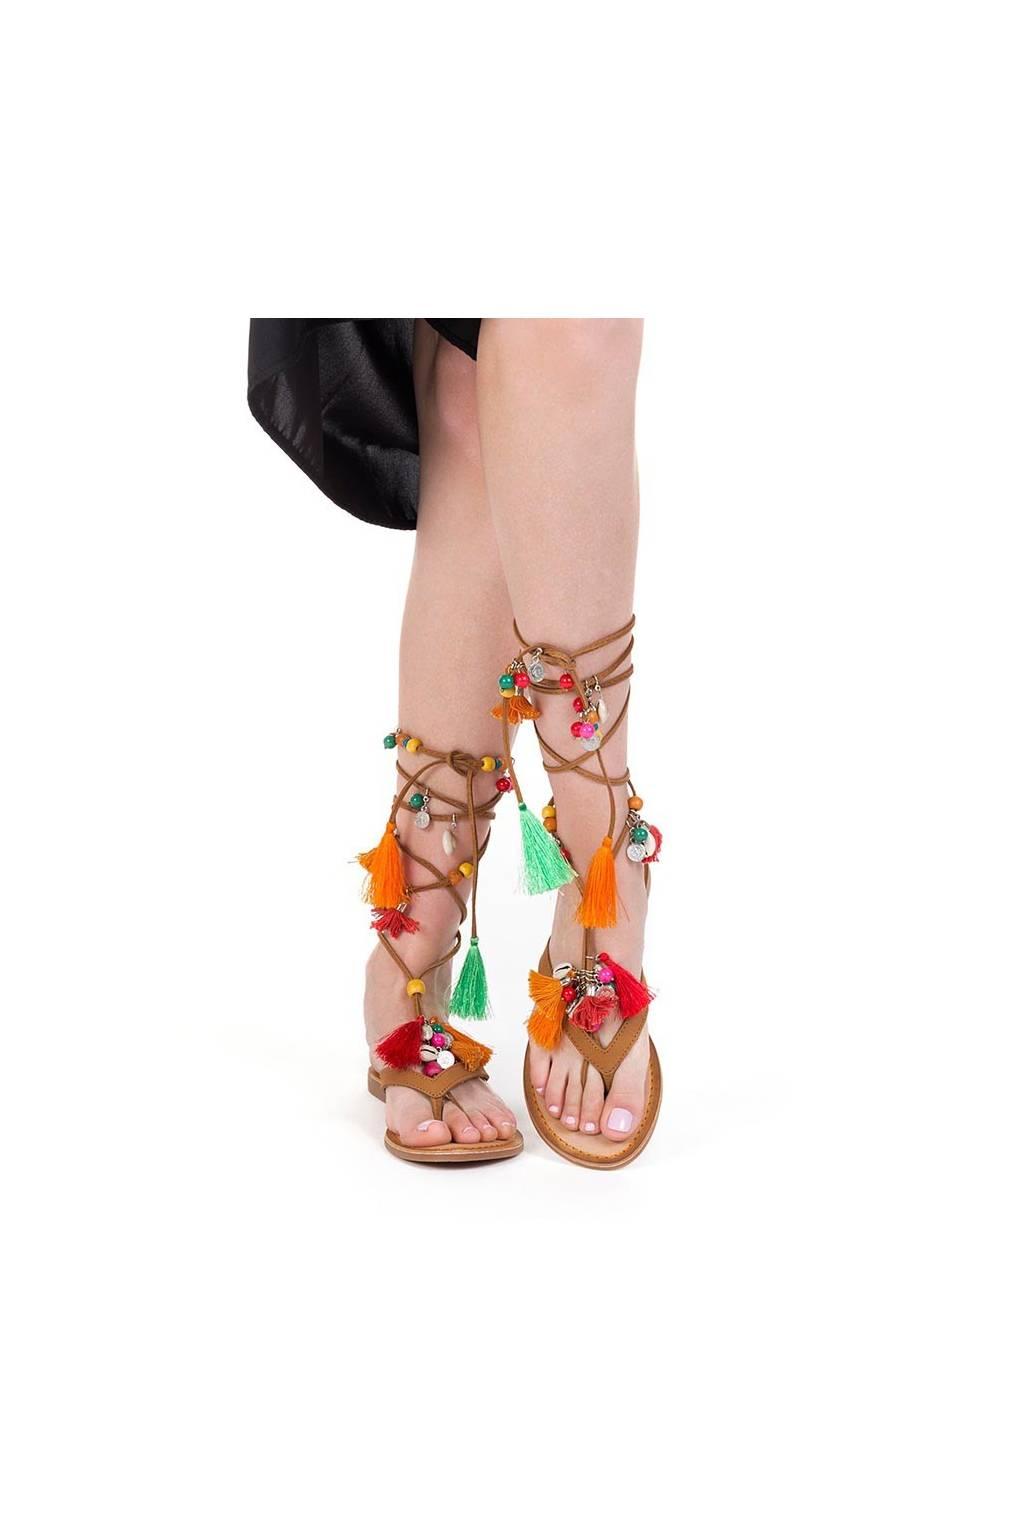 medinapiel es Decore Gioseppo Women sandals qPfYSwz